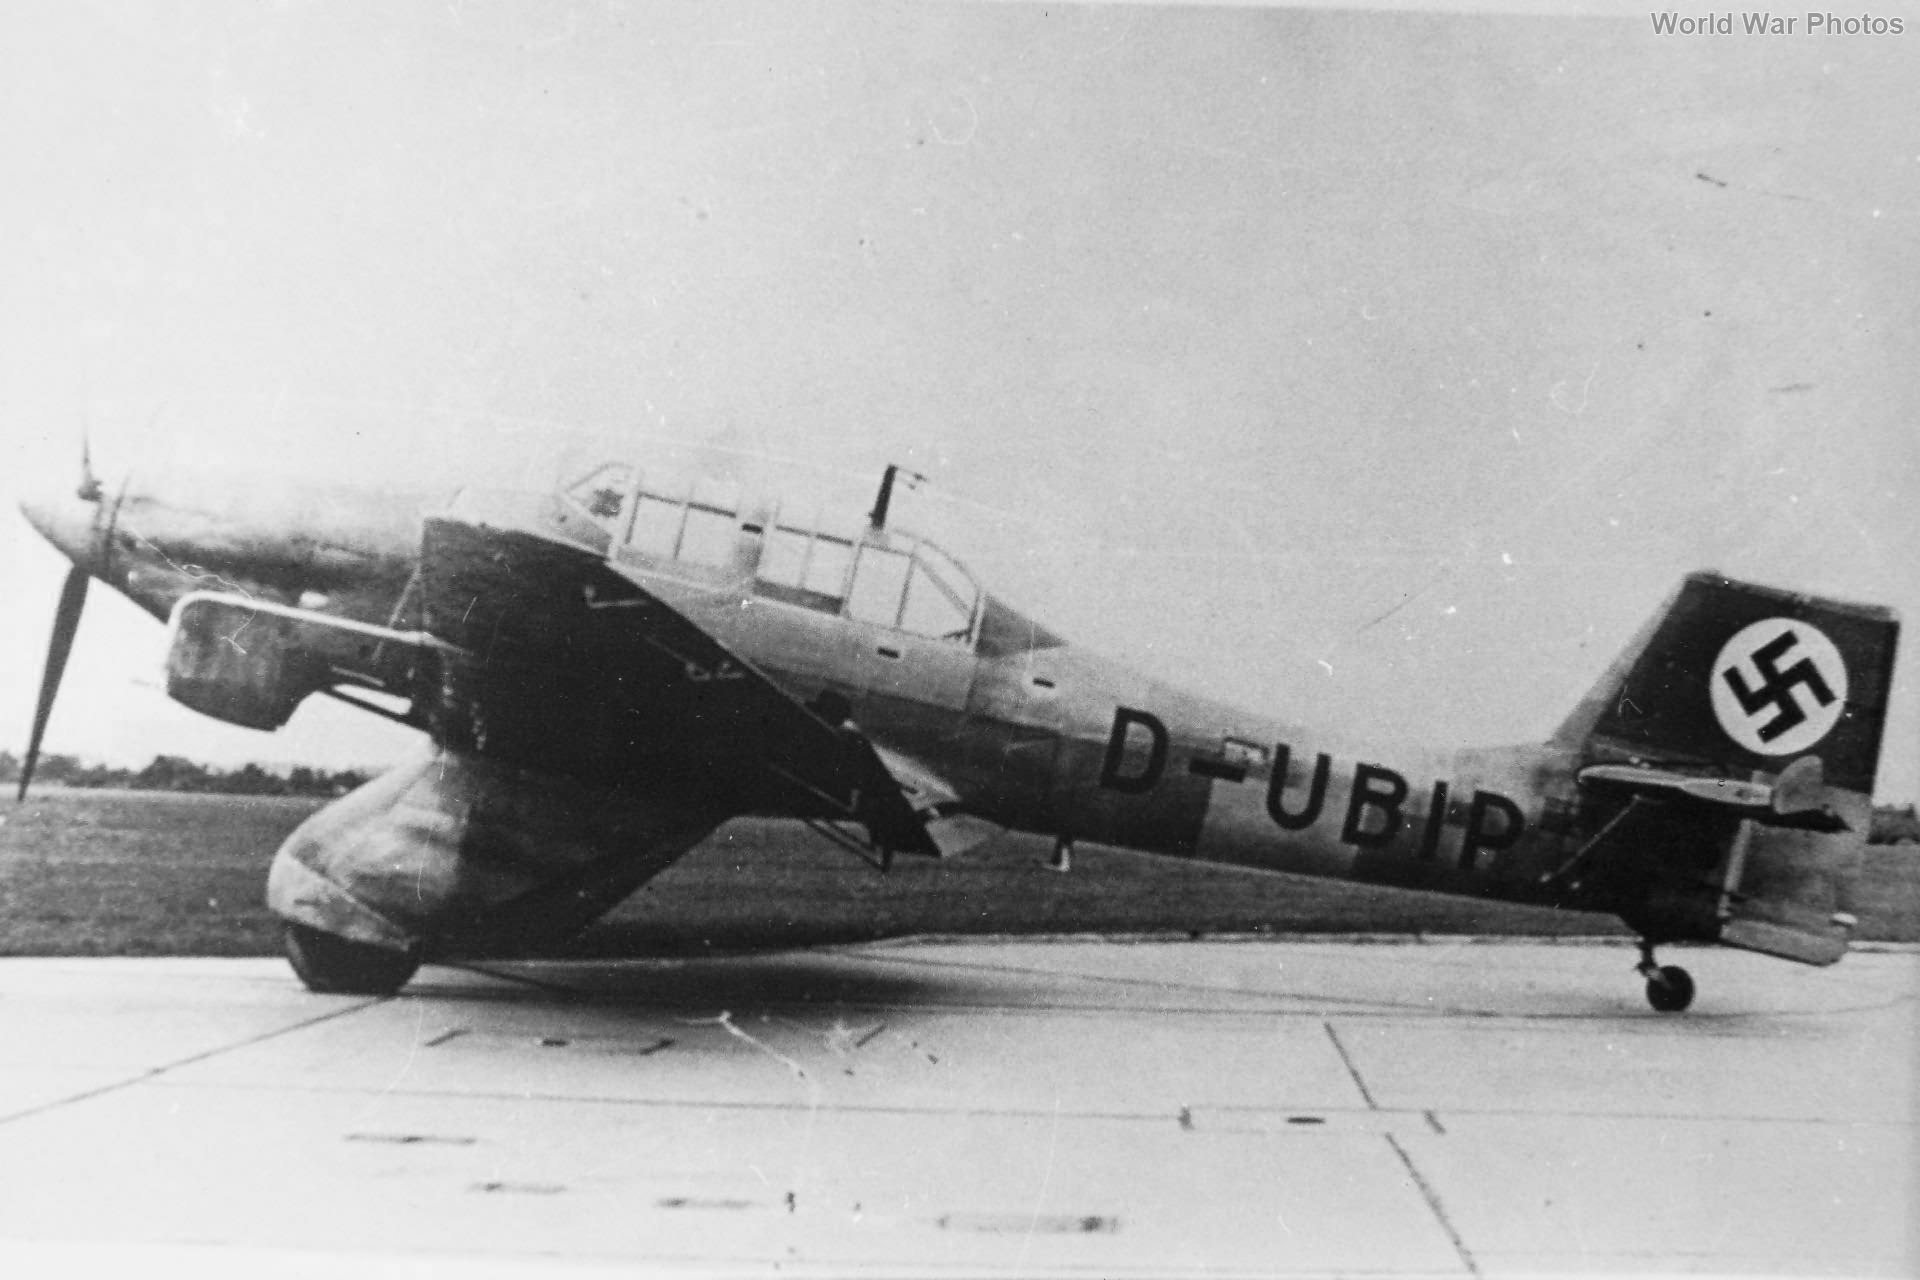 Junkers Ju 87 V-4 D-UBIP